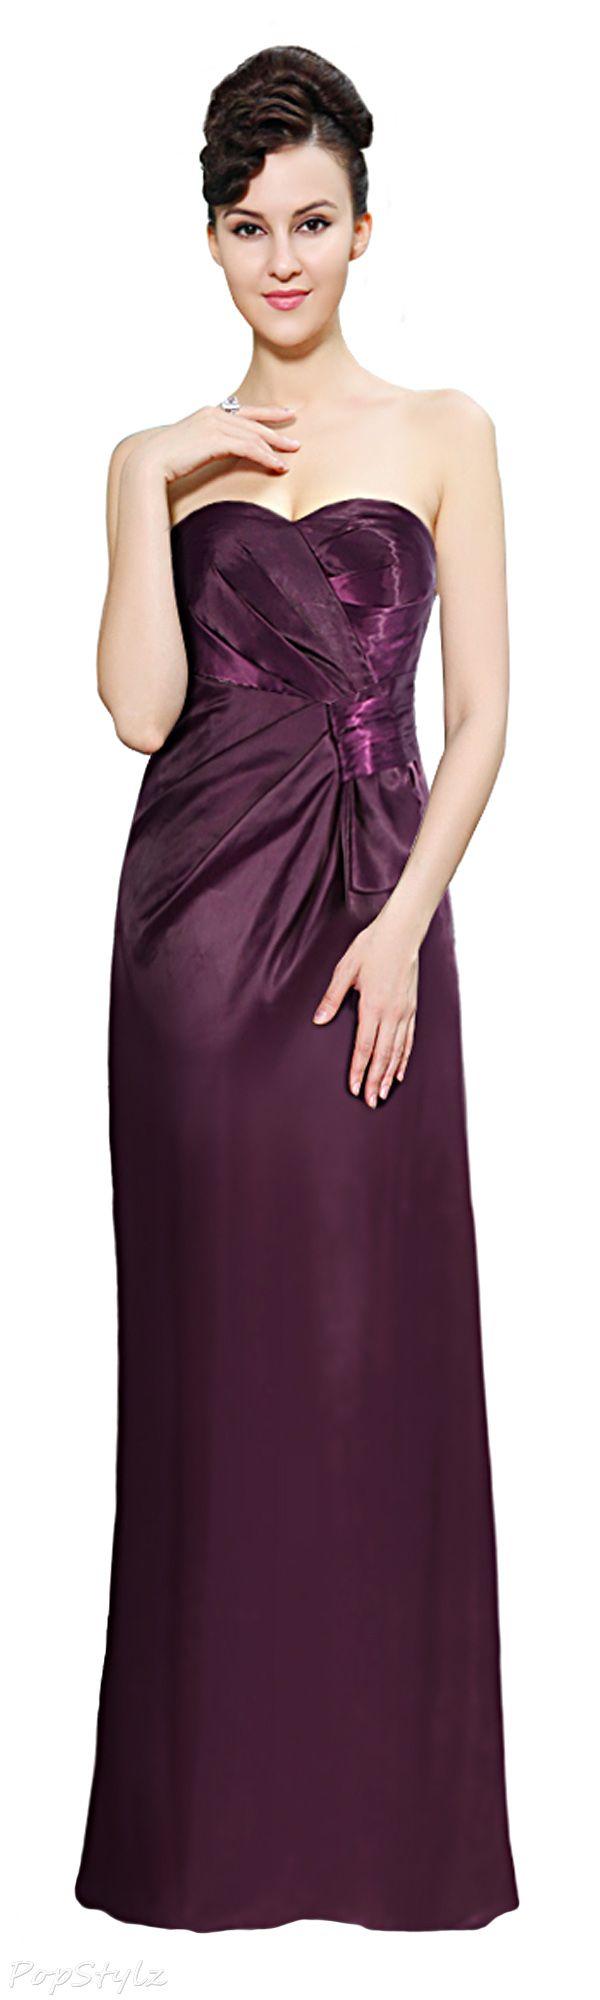 Elegant Long Purple Dress